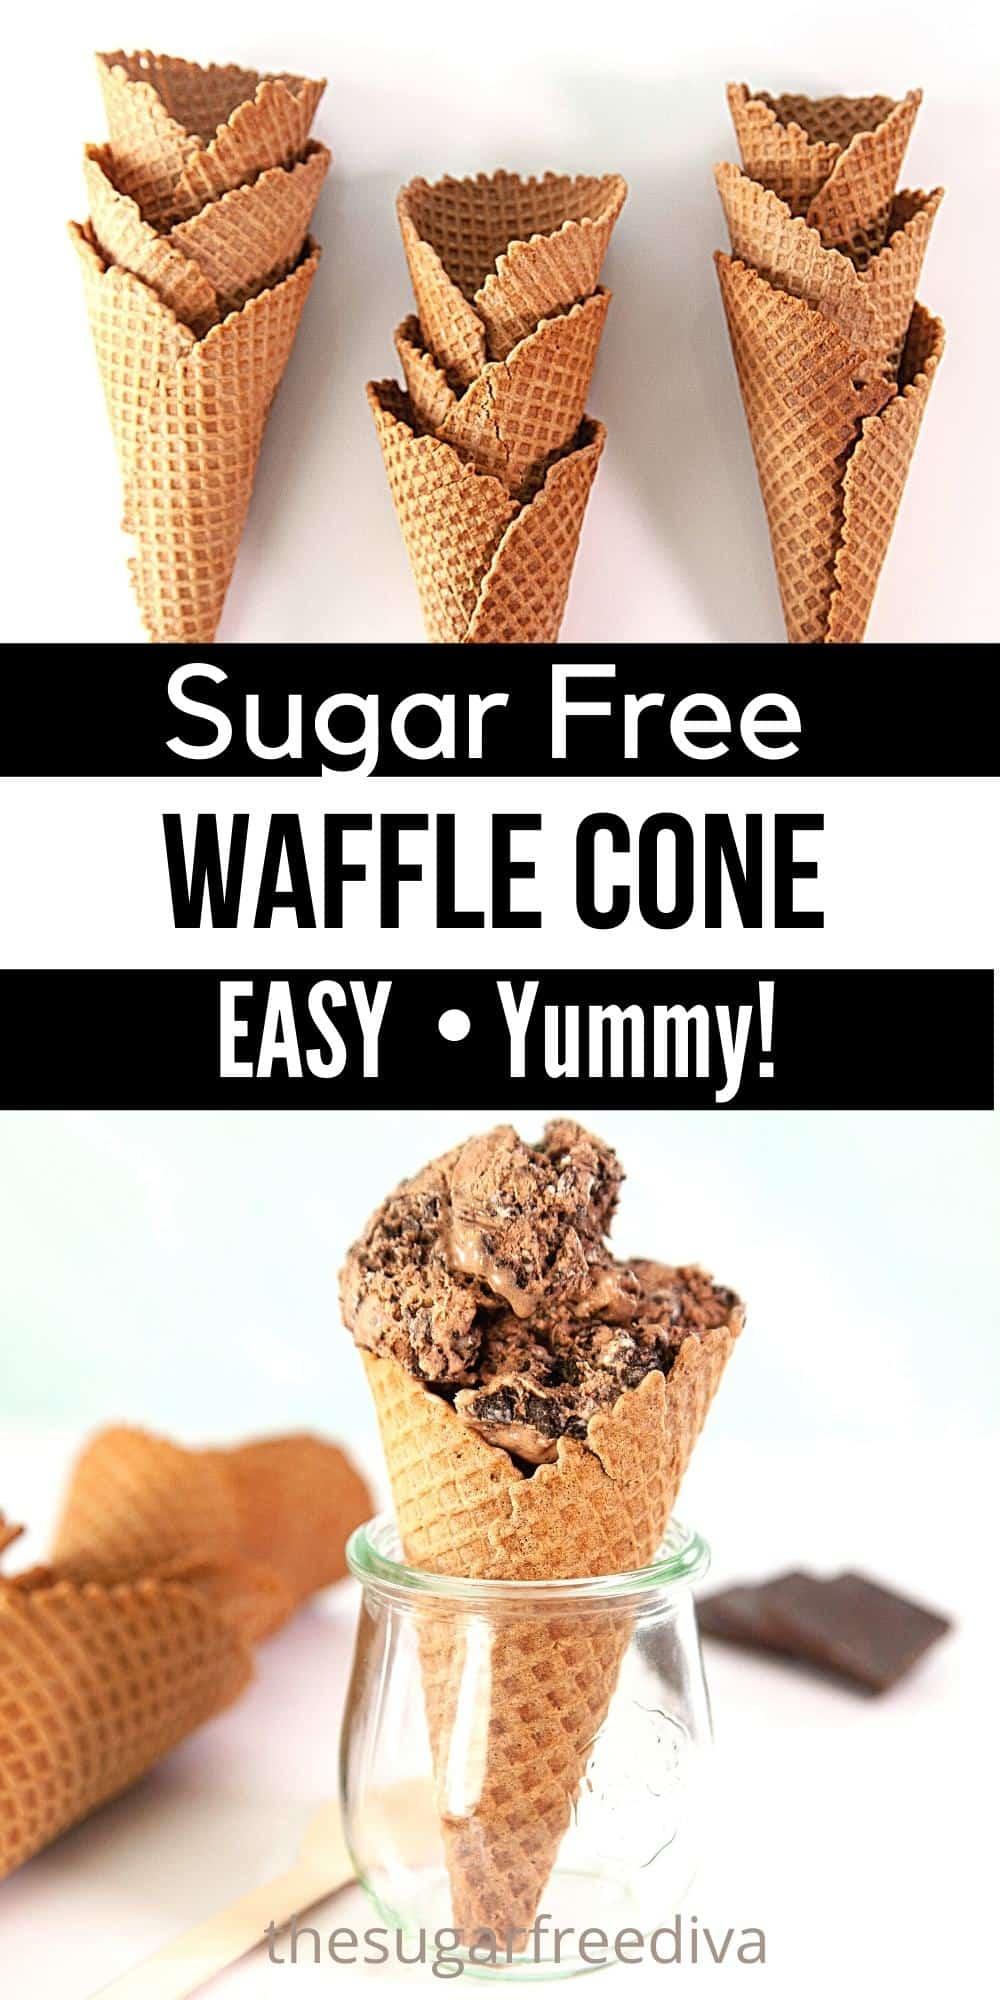 How to Make a Sugar Free Waffle Cone